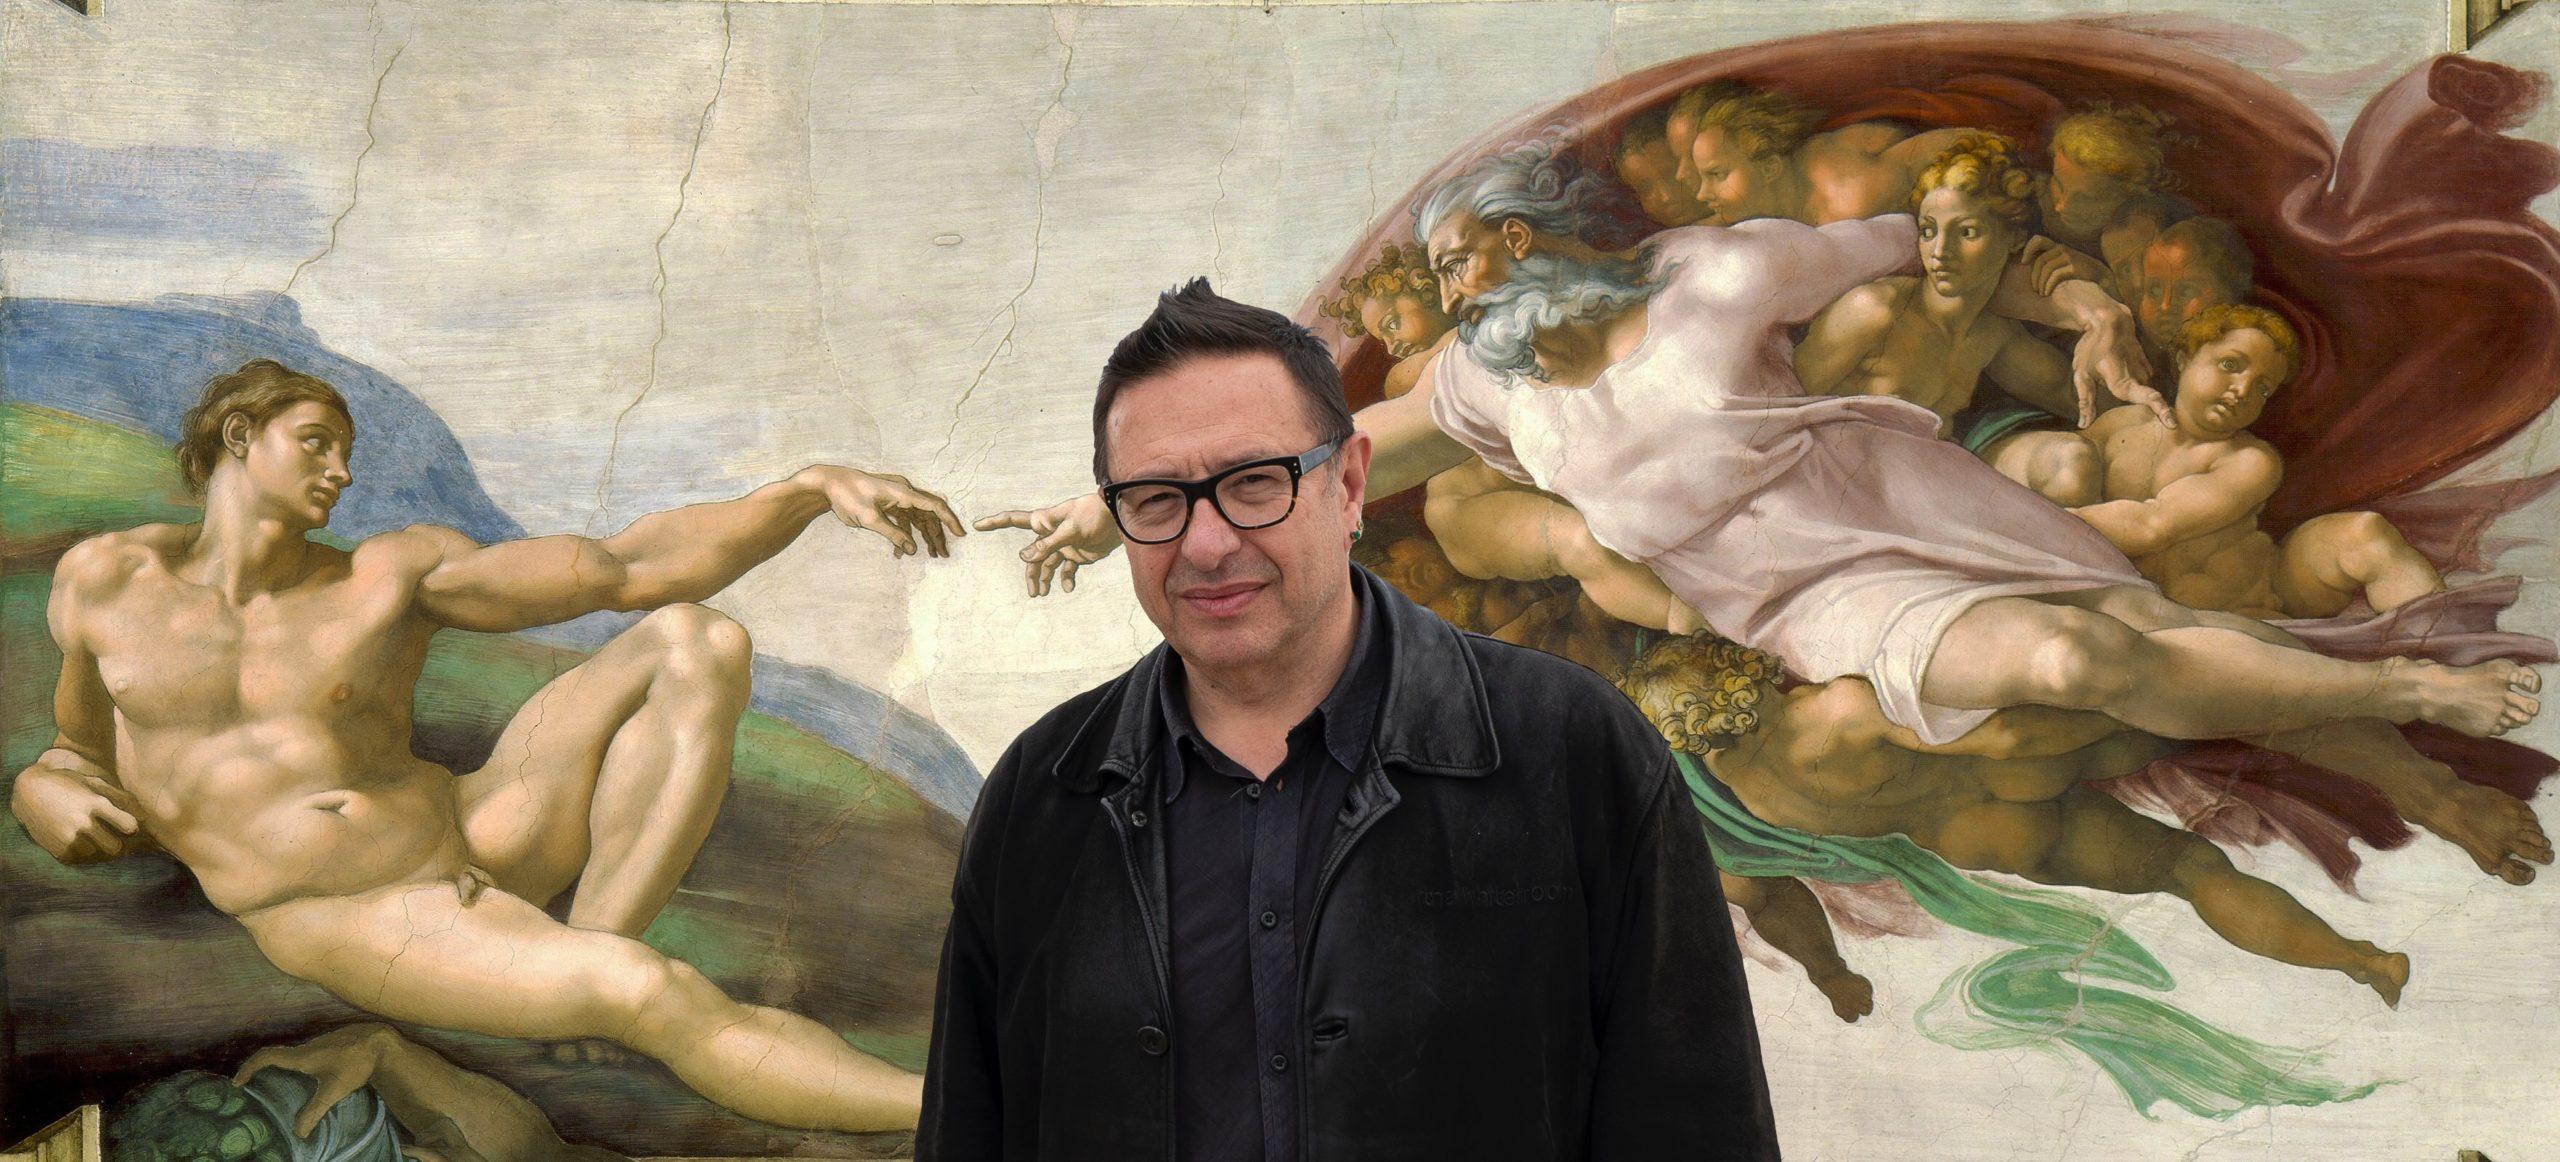 Waldemar Januszczak, art, Michelangelo, Sky Arts, writer, broadcaster, host, documentary, culture, The Times, Polish